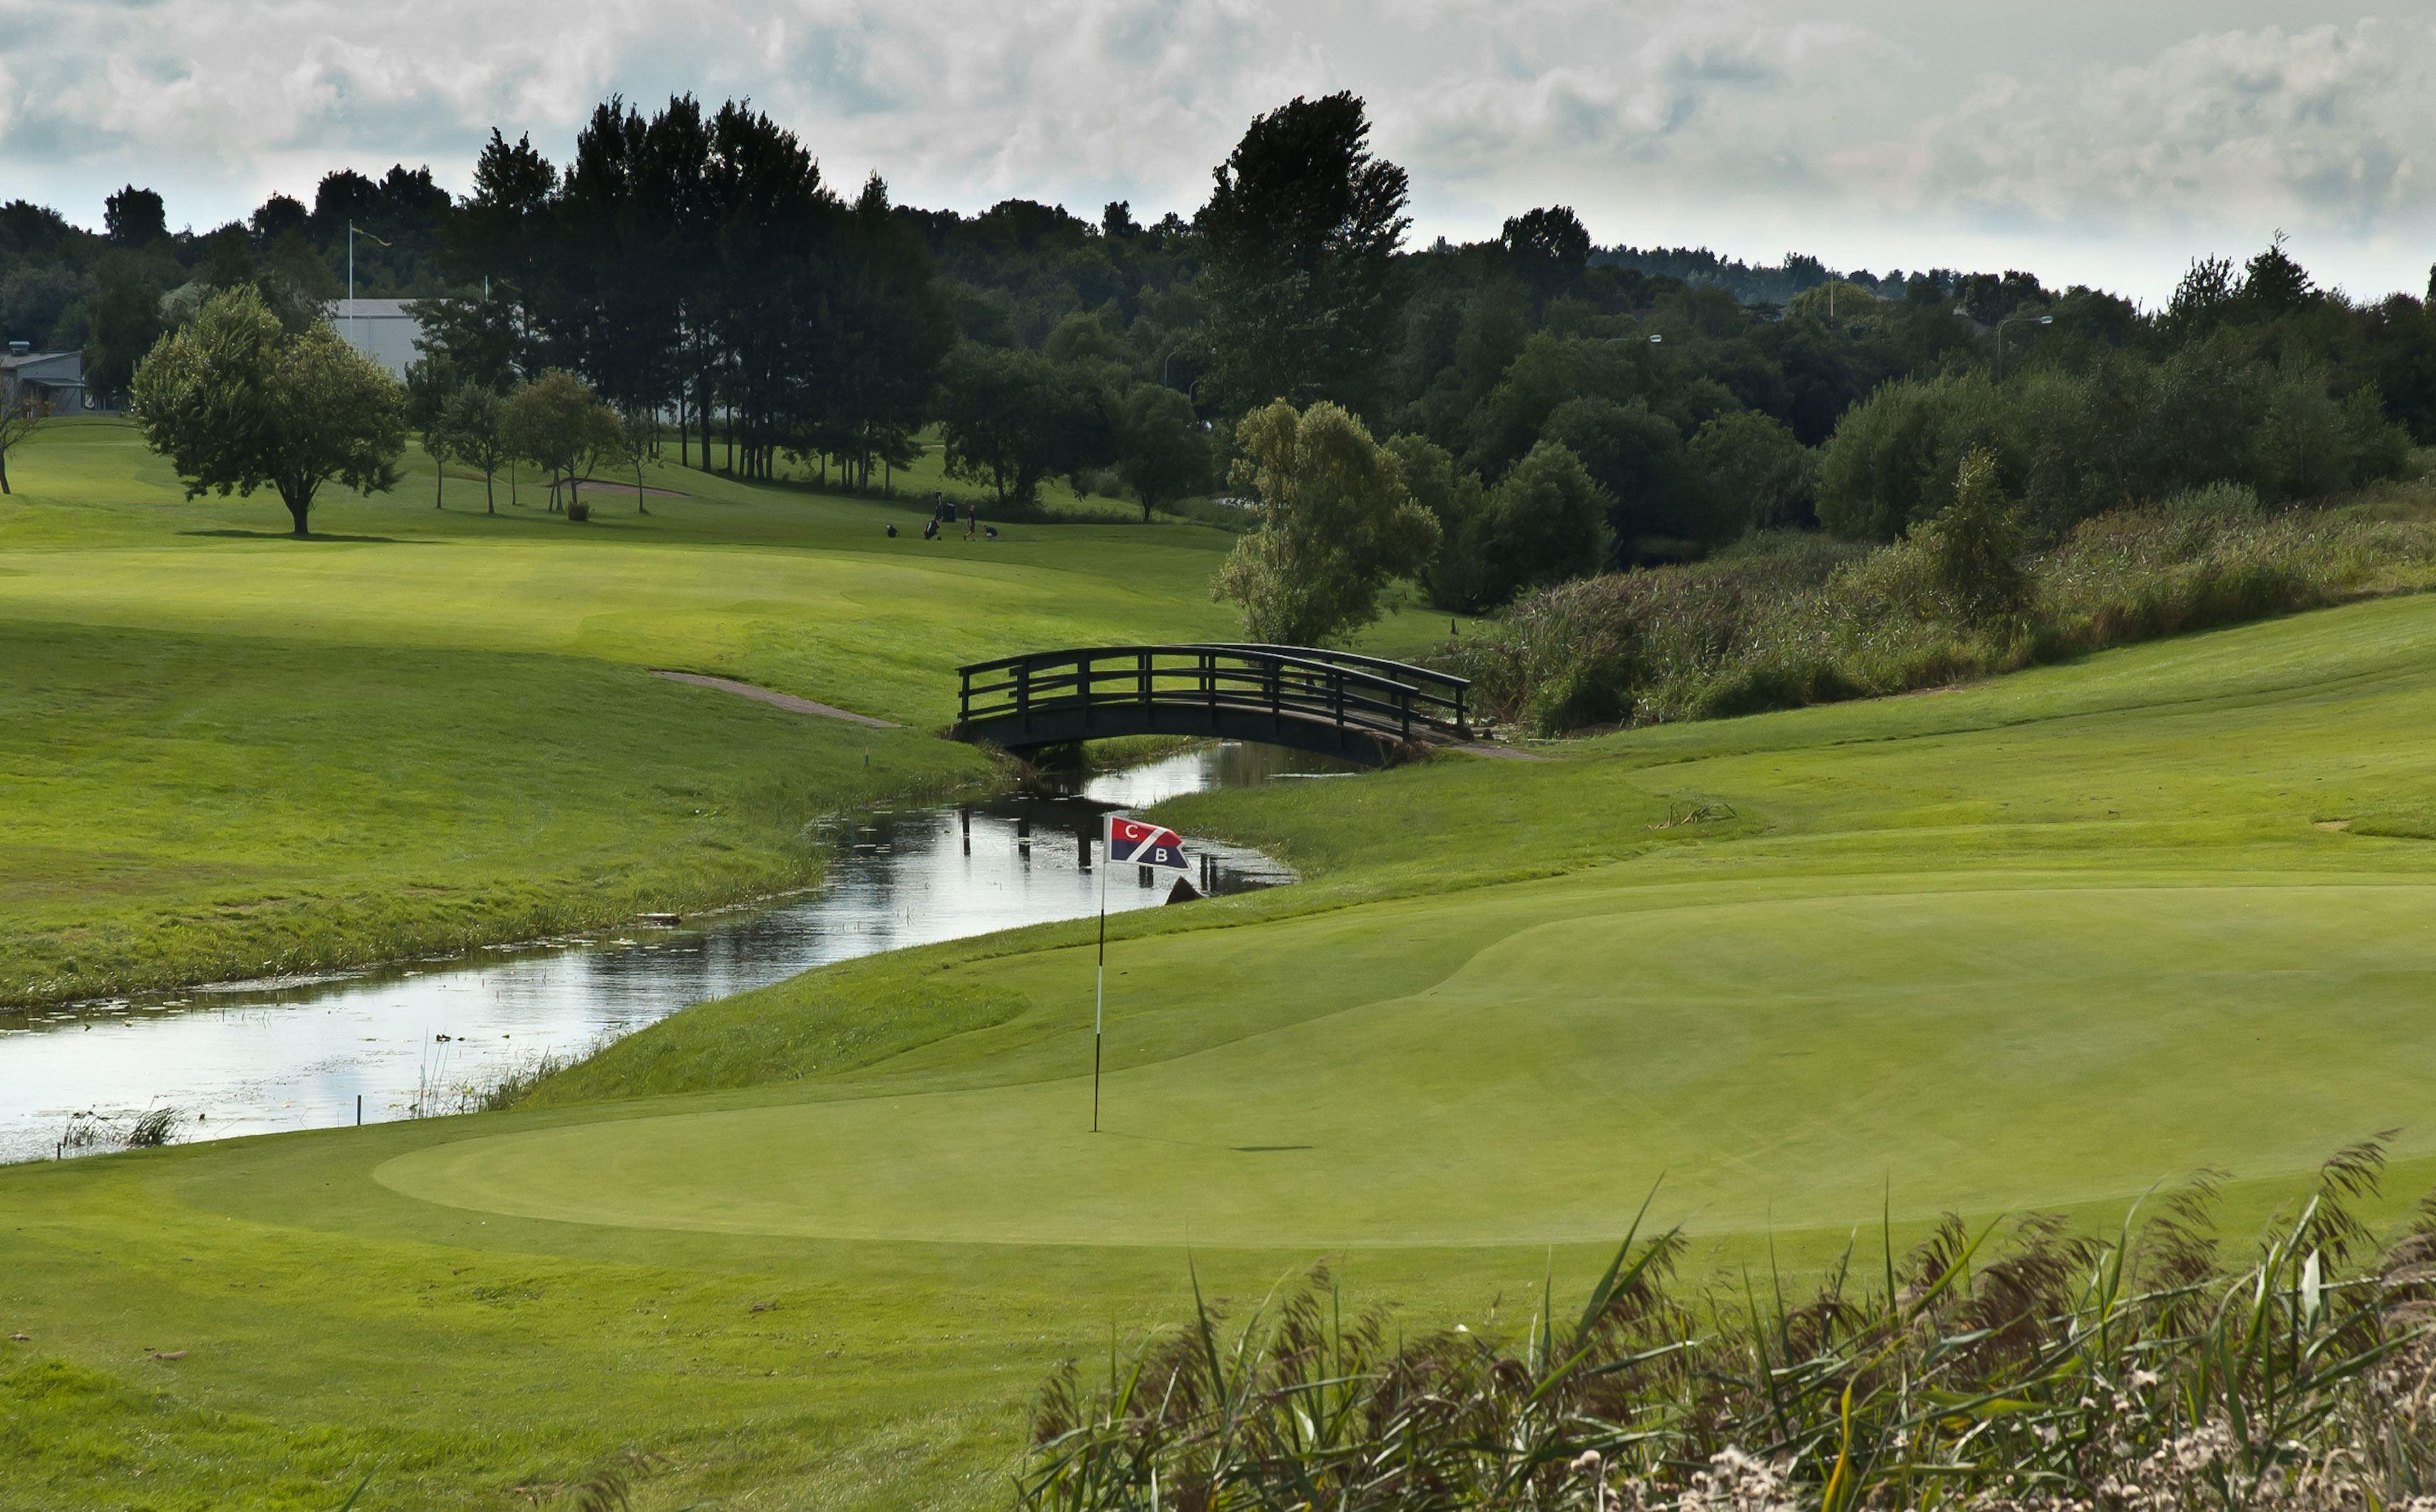 Forsgården Golfklubb